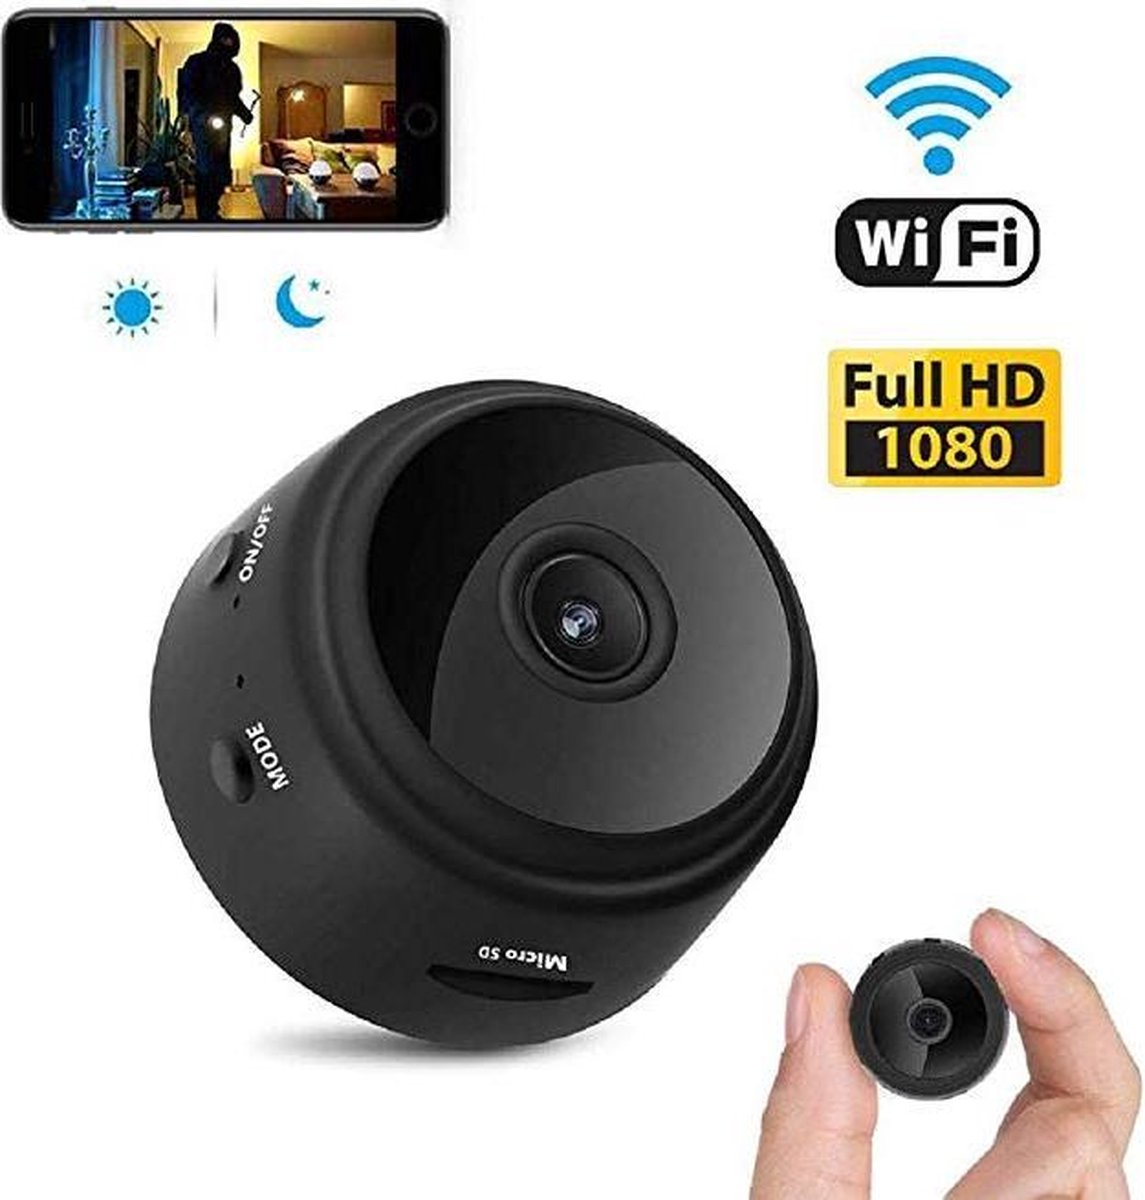 Camera   mini camera   beveiligingscamera   verborgen camera   wifi spy camera   1080P incl. SD kaar